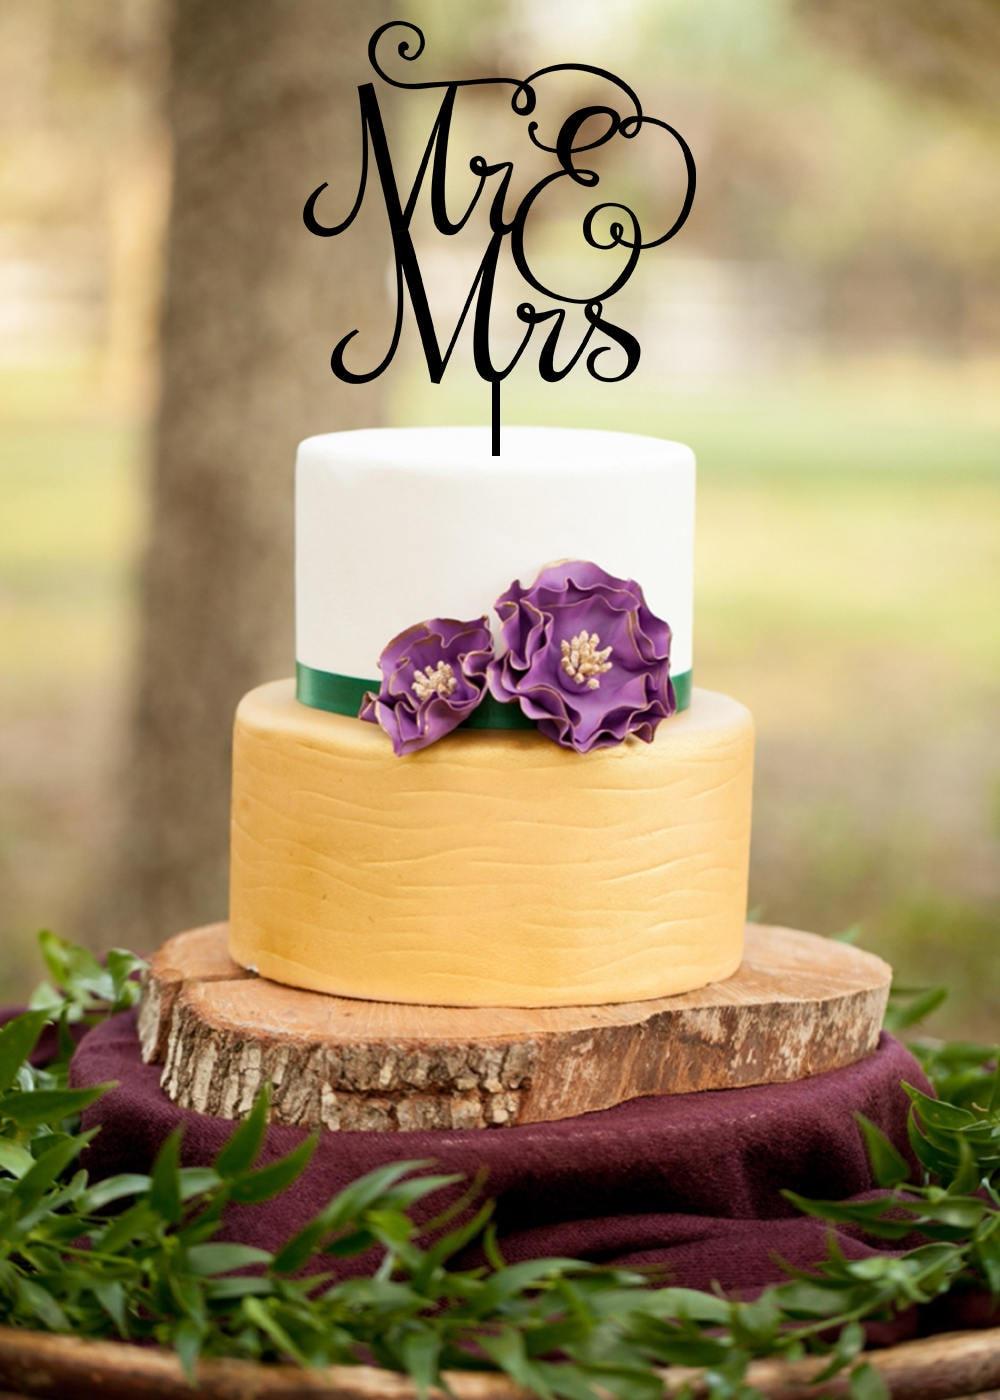 Mr and Mrs Wedding Cake Topper | Etsy